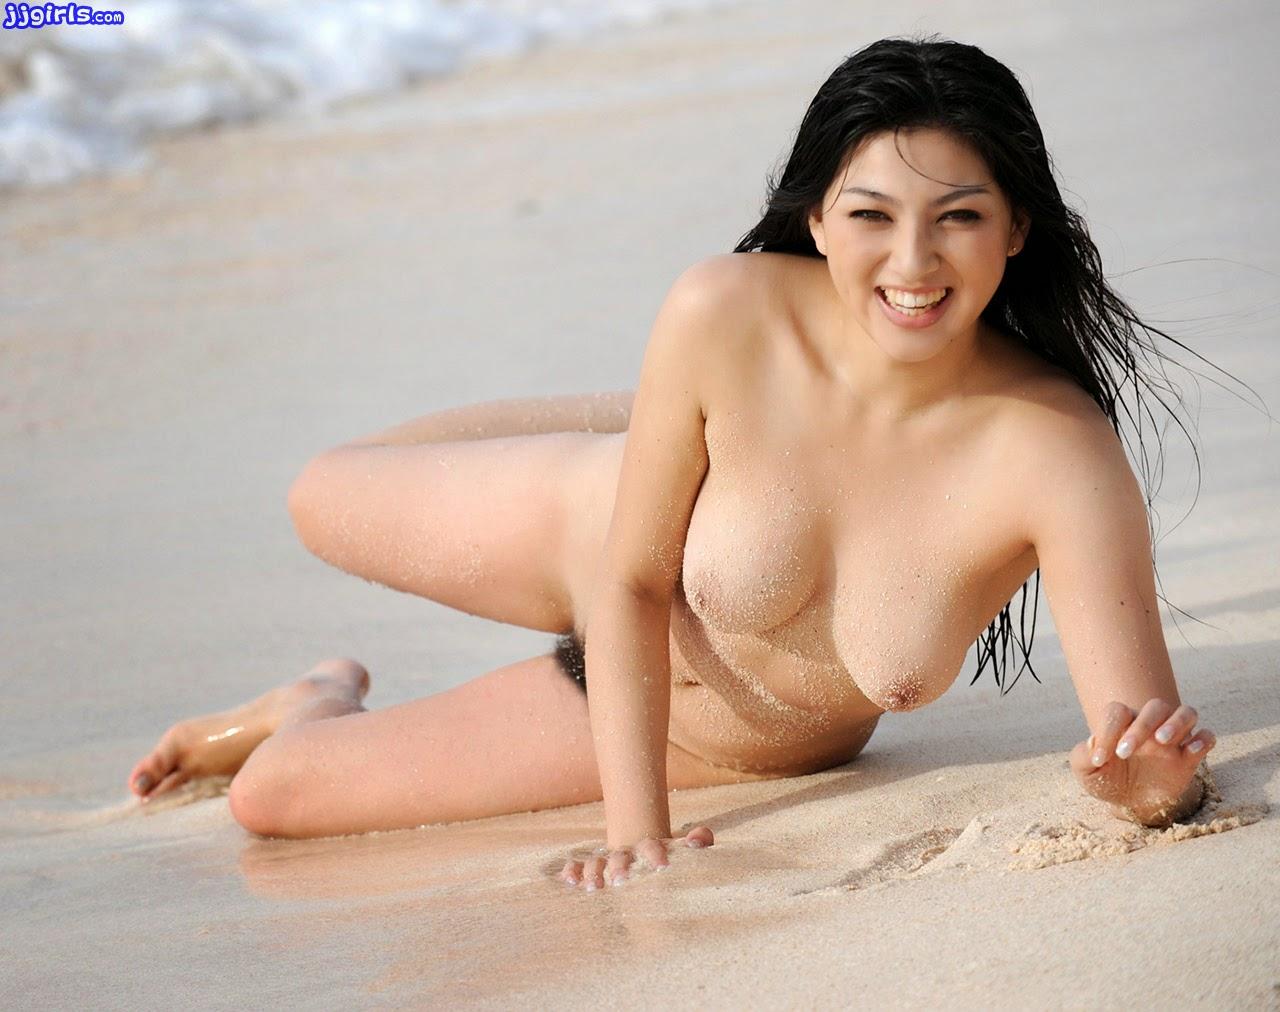 Film Bintang Bokep Hot Artis Jepang Saori Hara